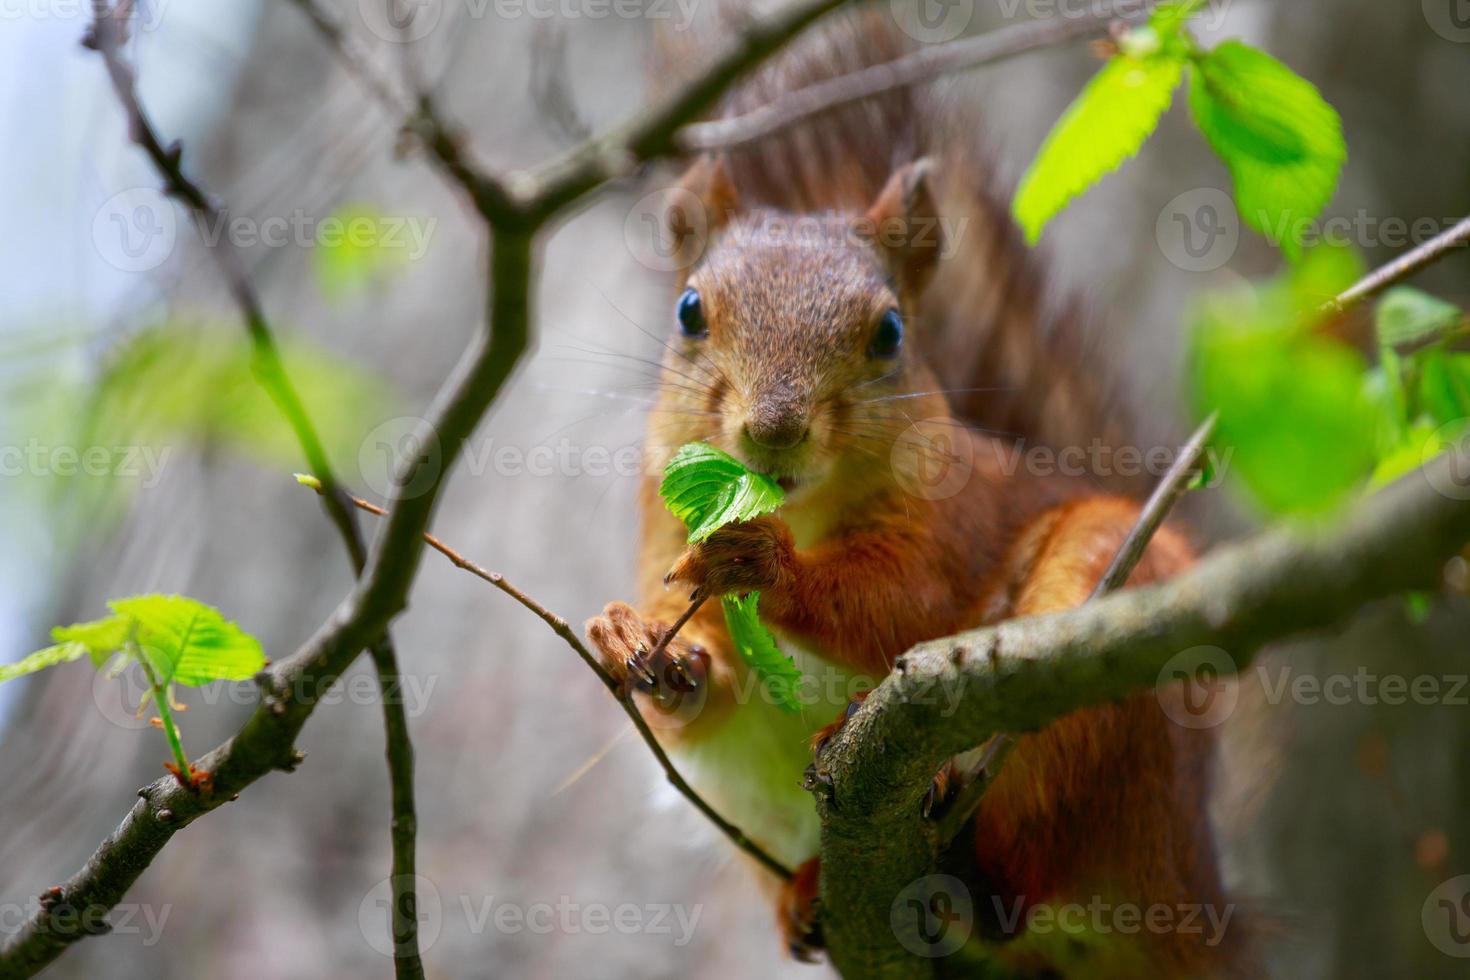 ekorren äter ett blad av trädet. foto